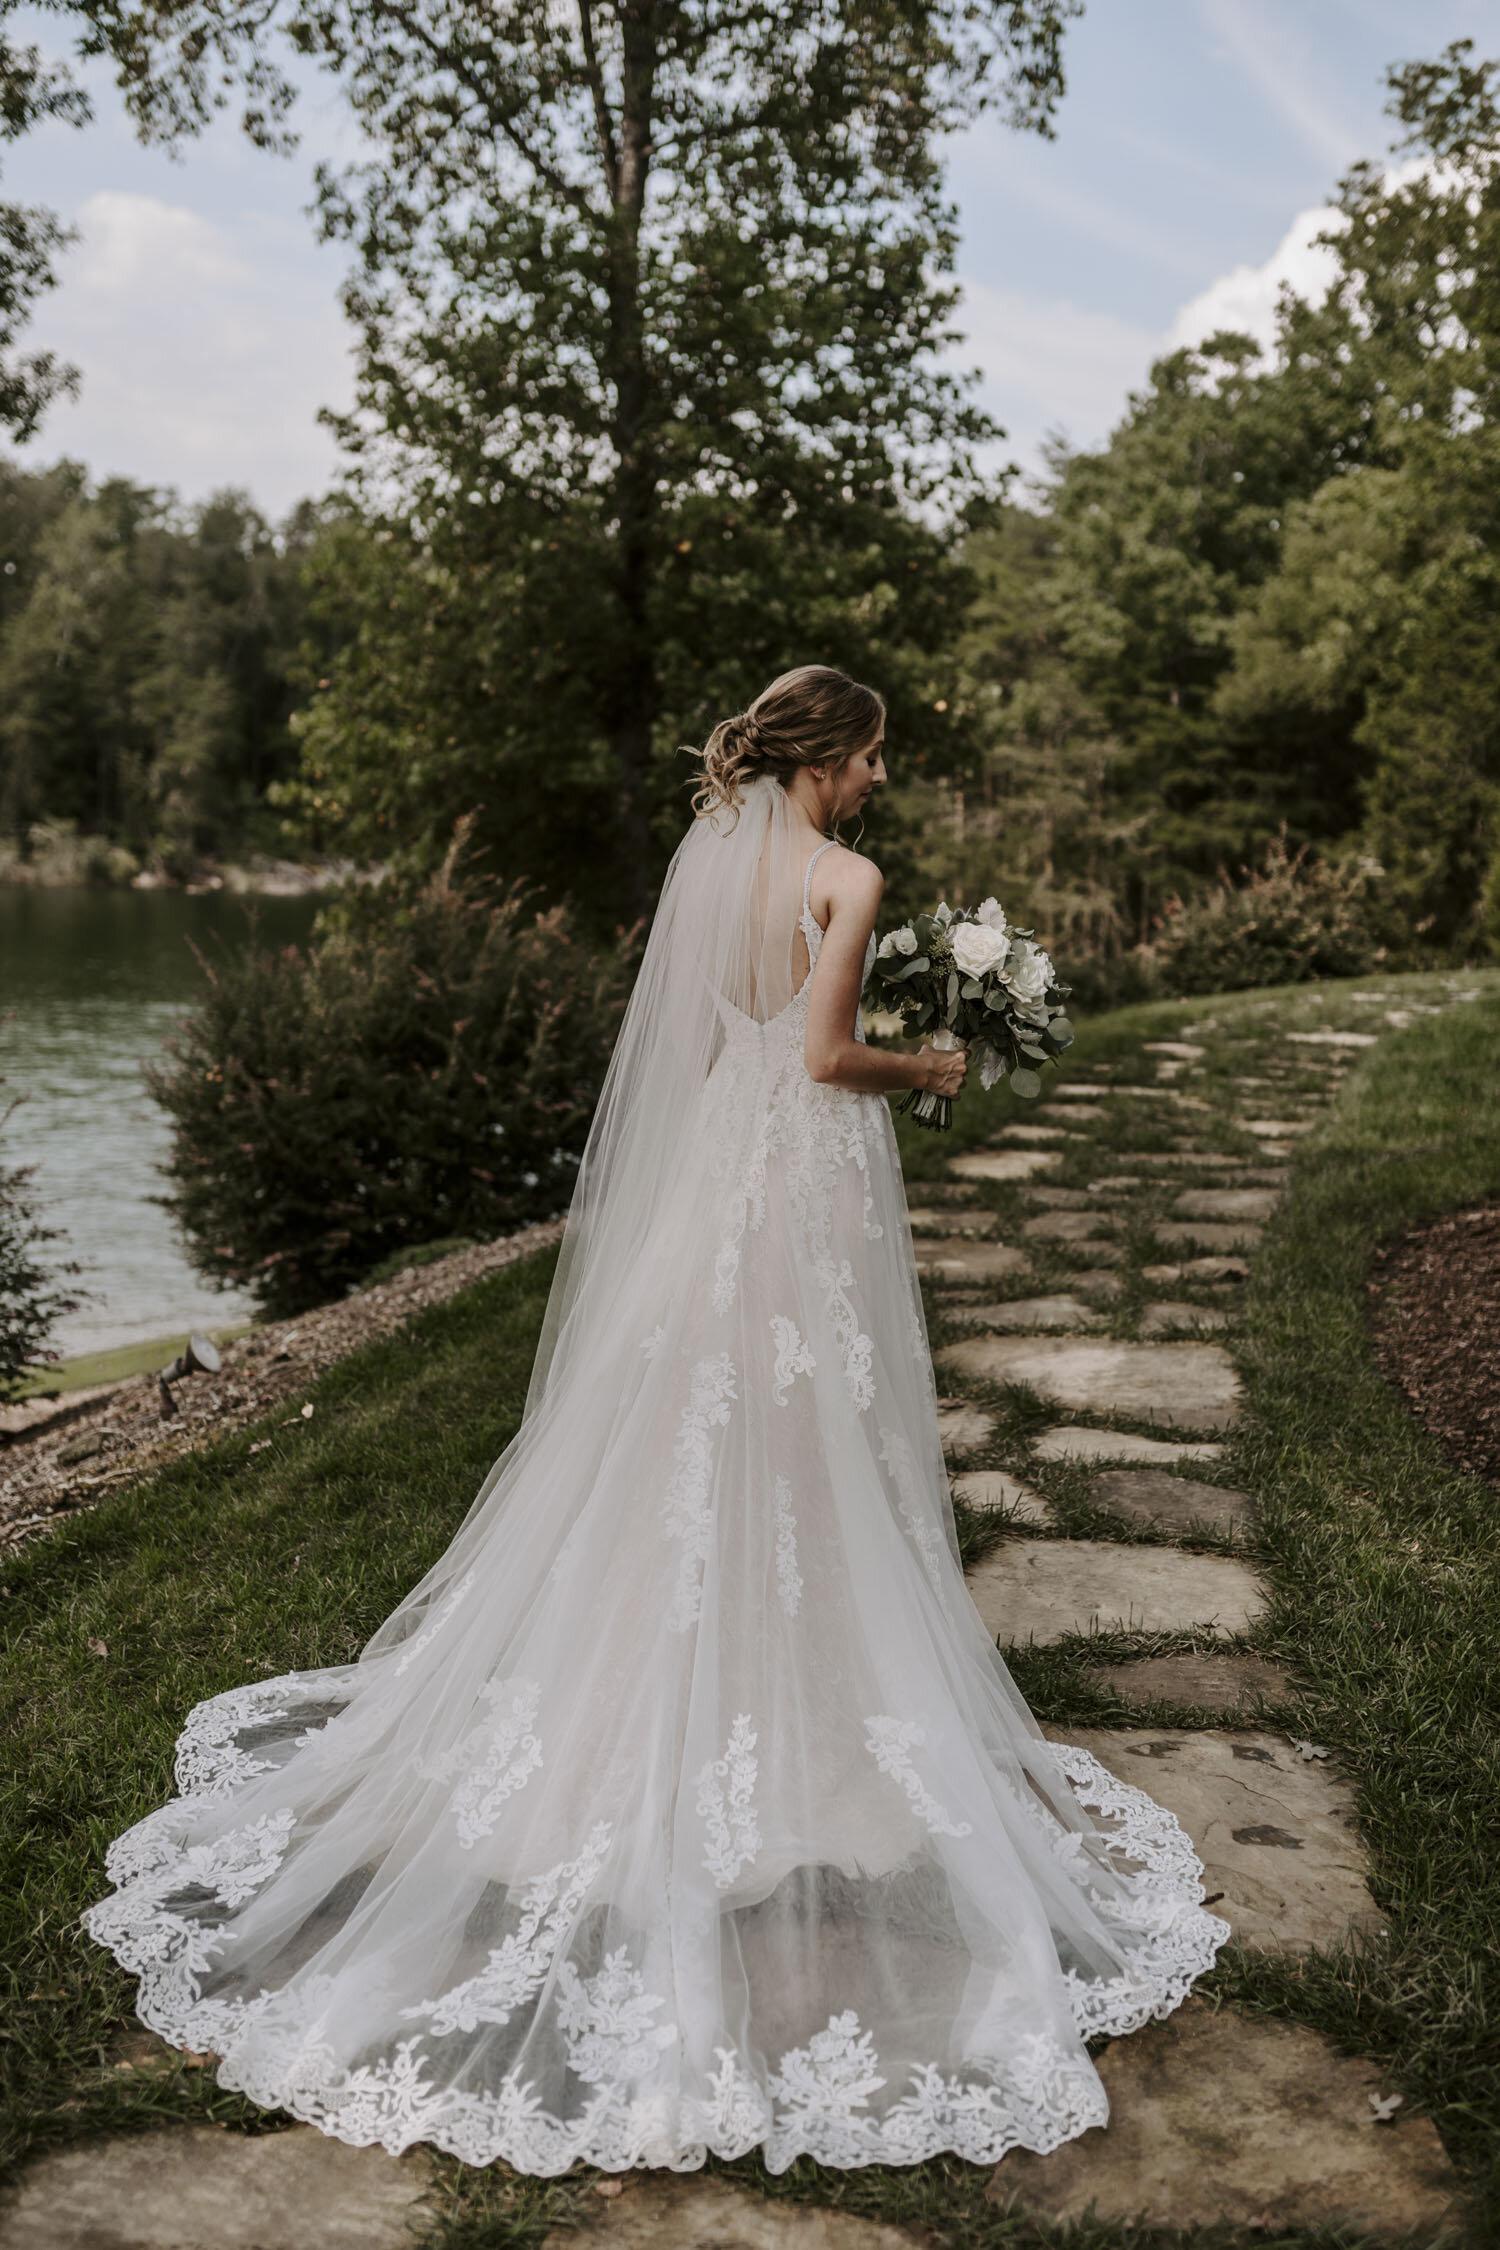 Romantic Bridal Portraits with denim jacket  at Bella Collina   By Greensboro, NC Wedding Photographer: Kayli LaFon Photography